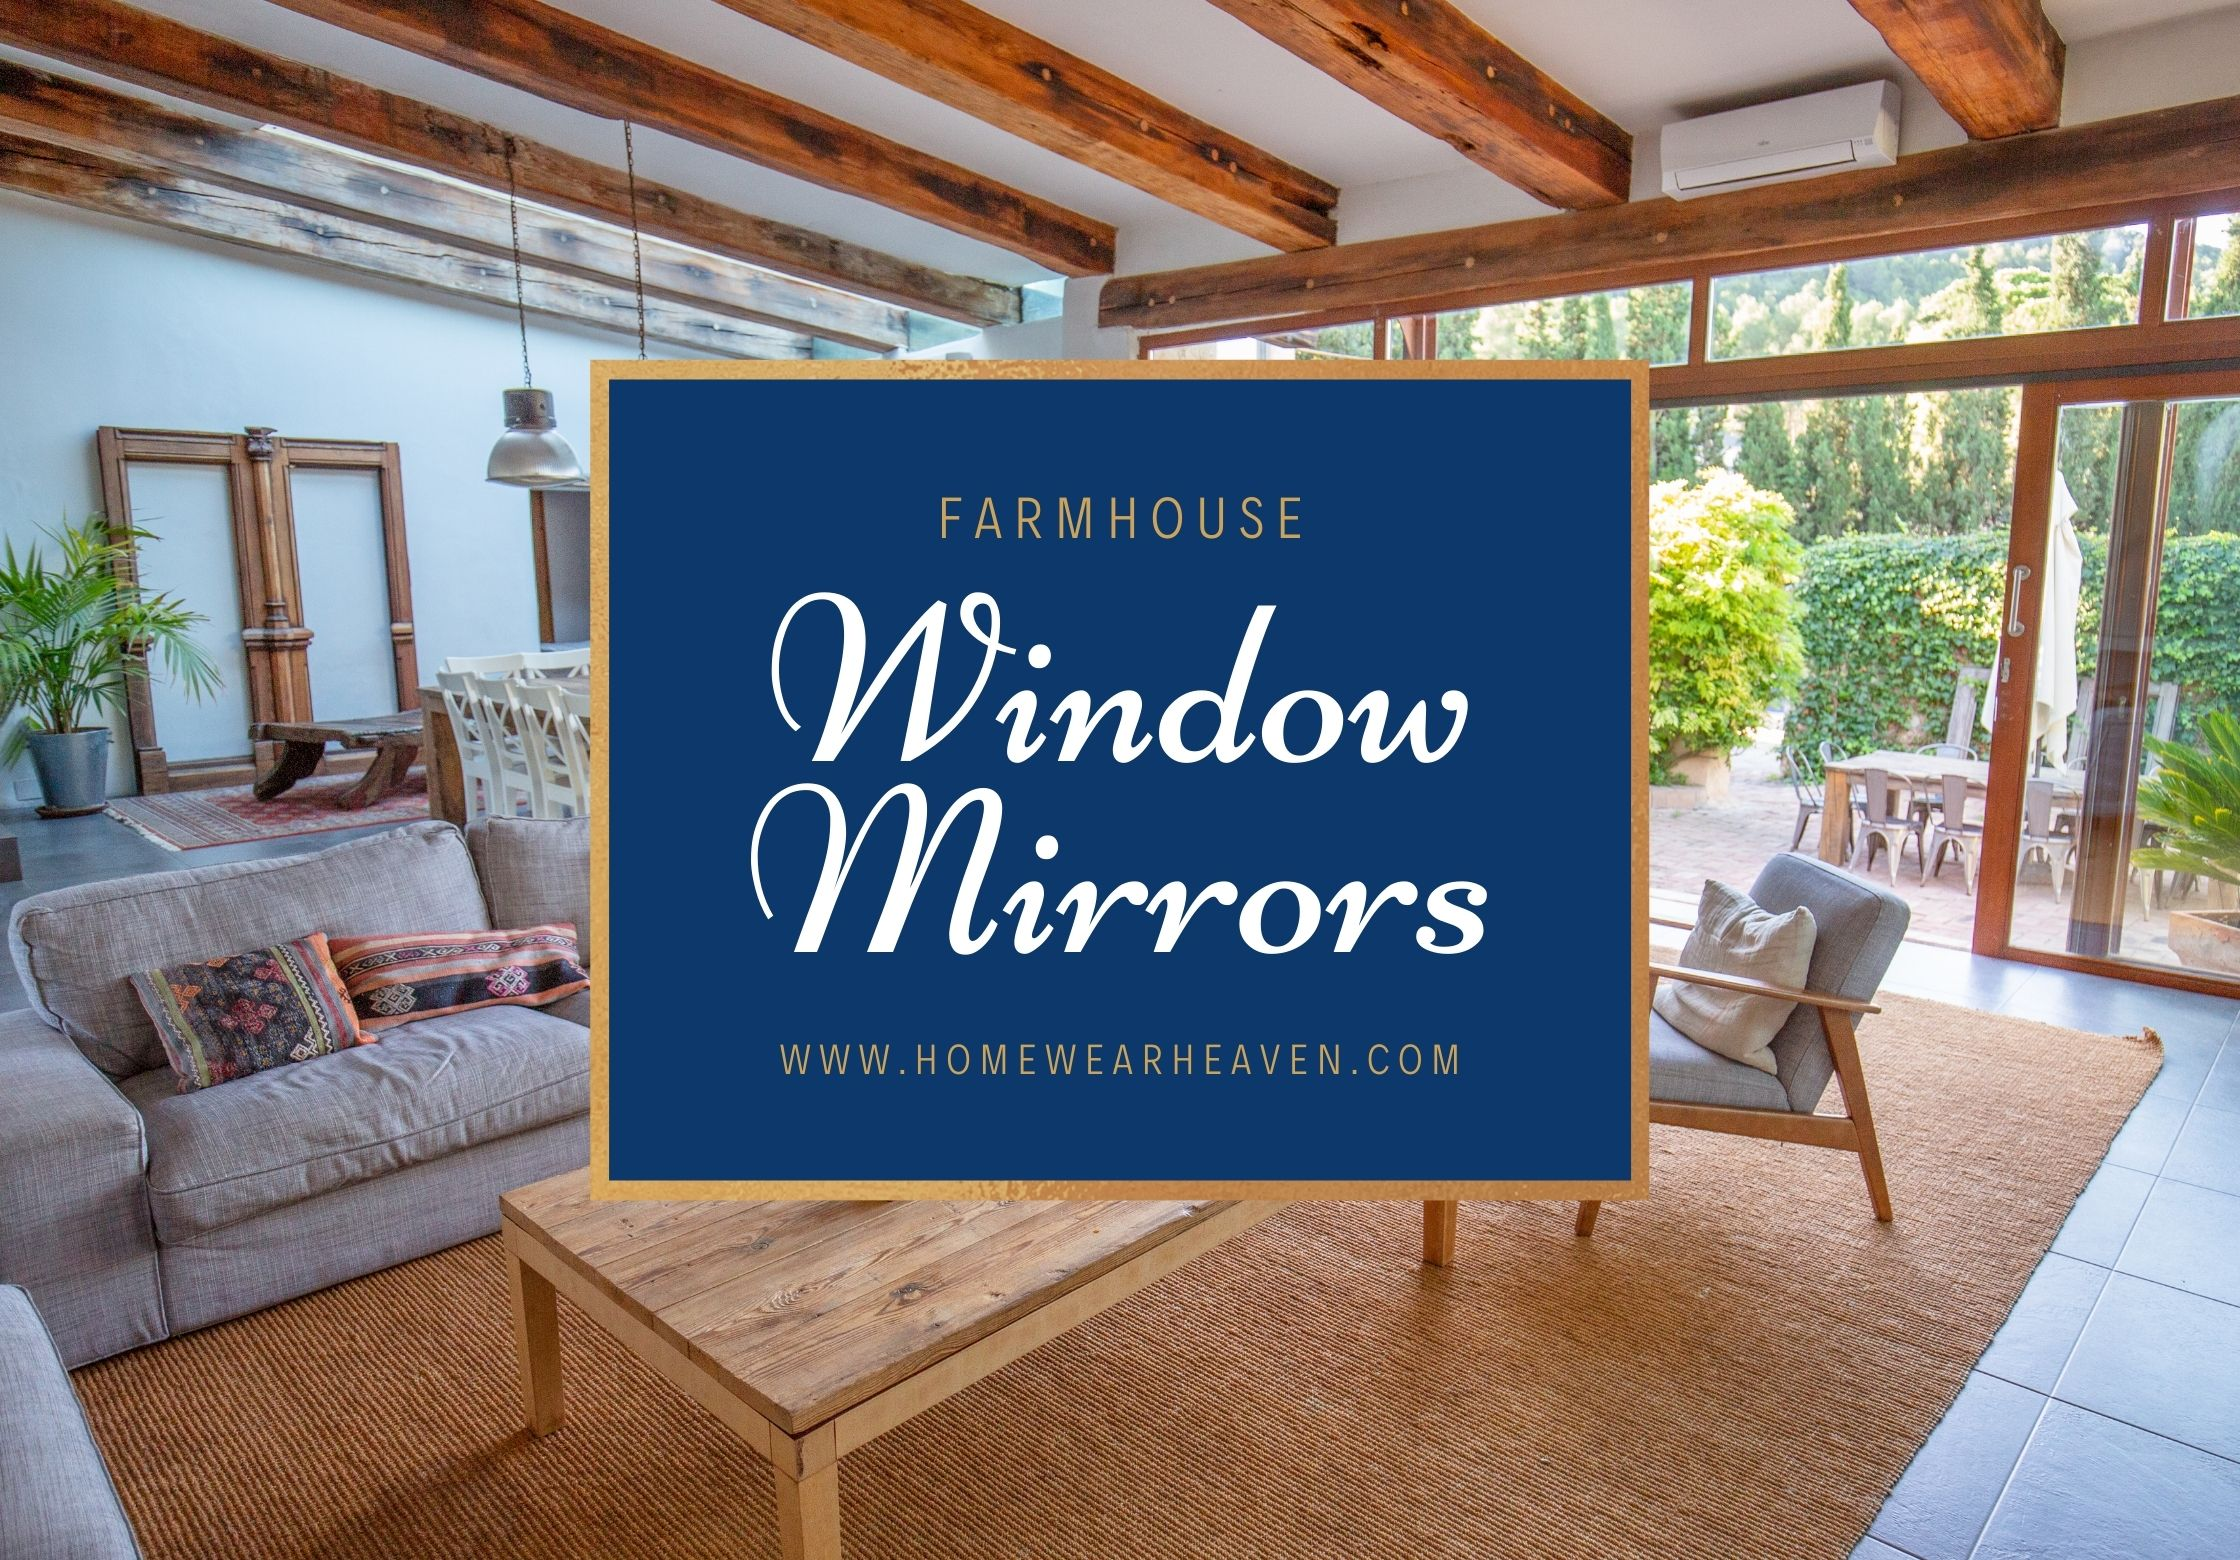 Top 10 Best Farmhouse Window Mirrors in 2021